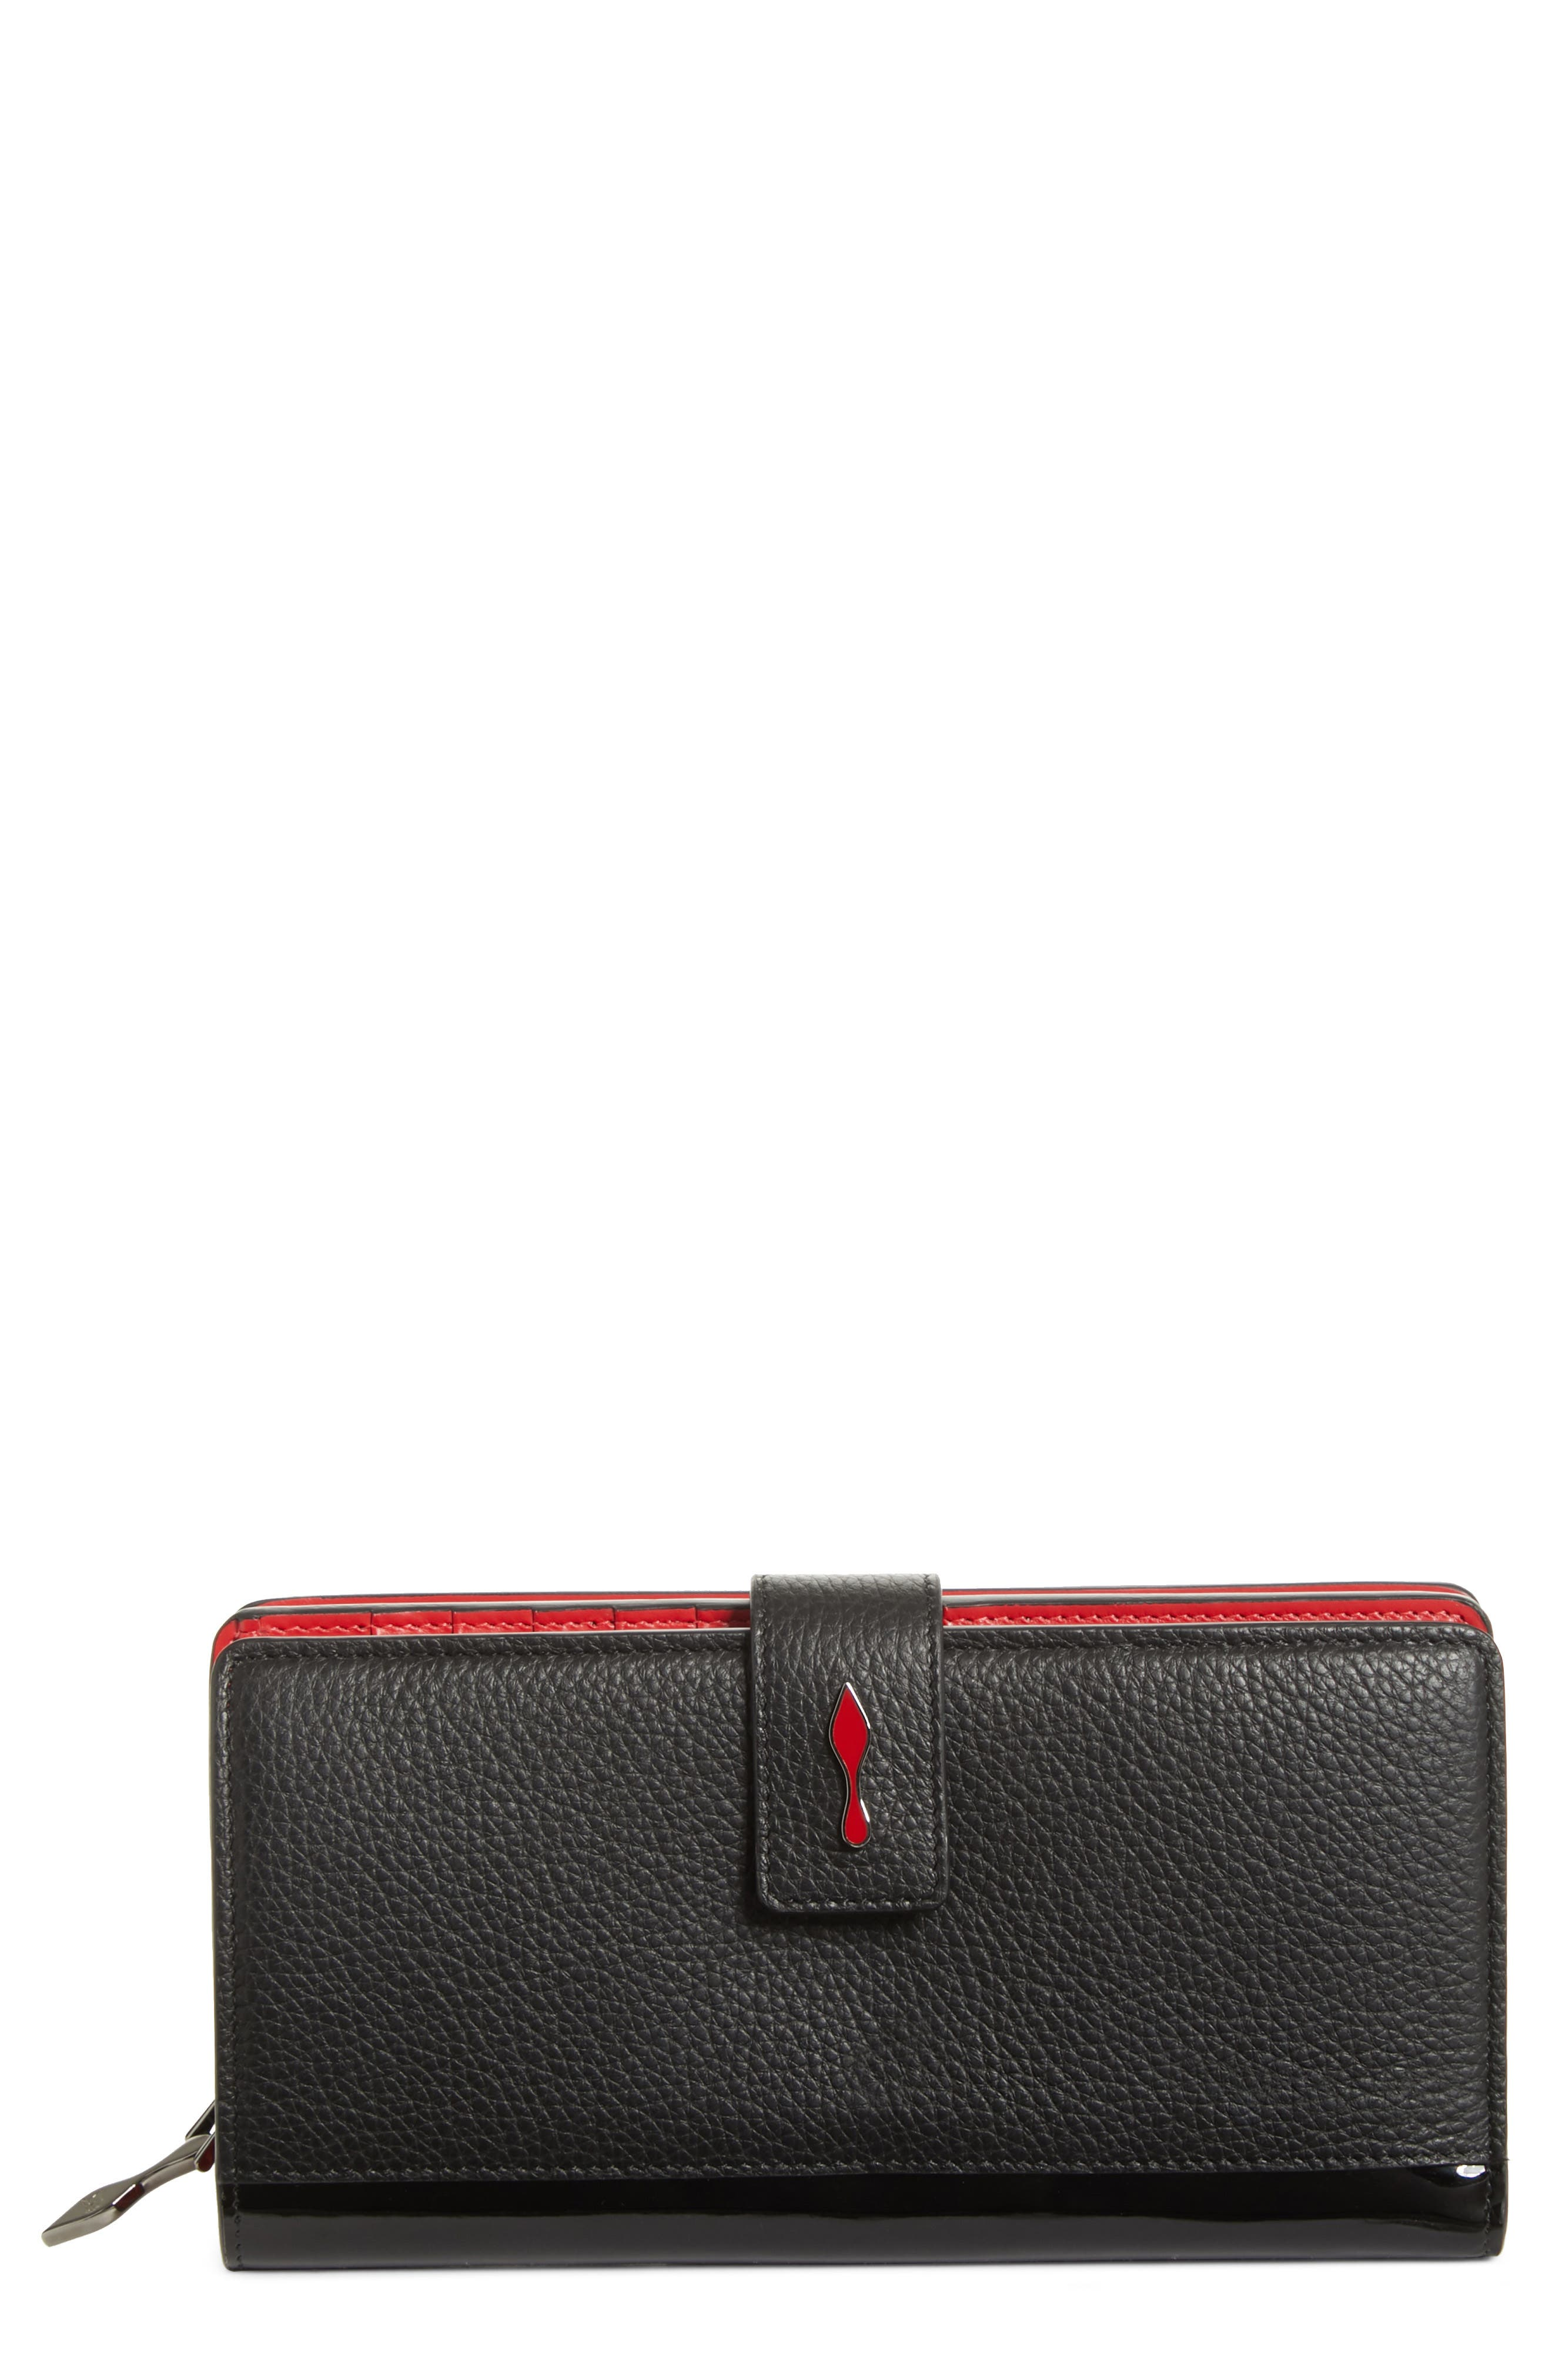 CHRISTIAN LOUBOUTIN,                             Paloma Calfskin Leather Wallet,                             Main thumbnail 1, color,                             007